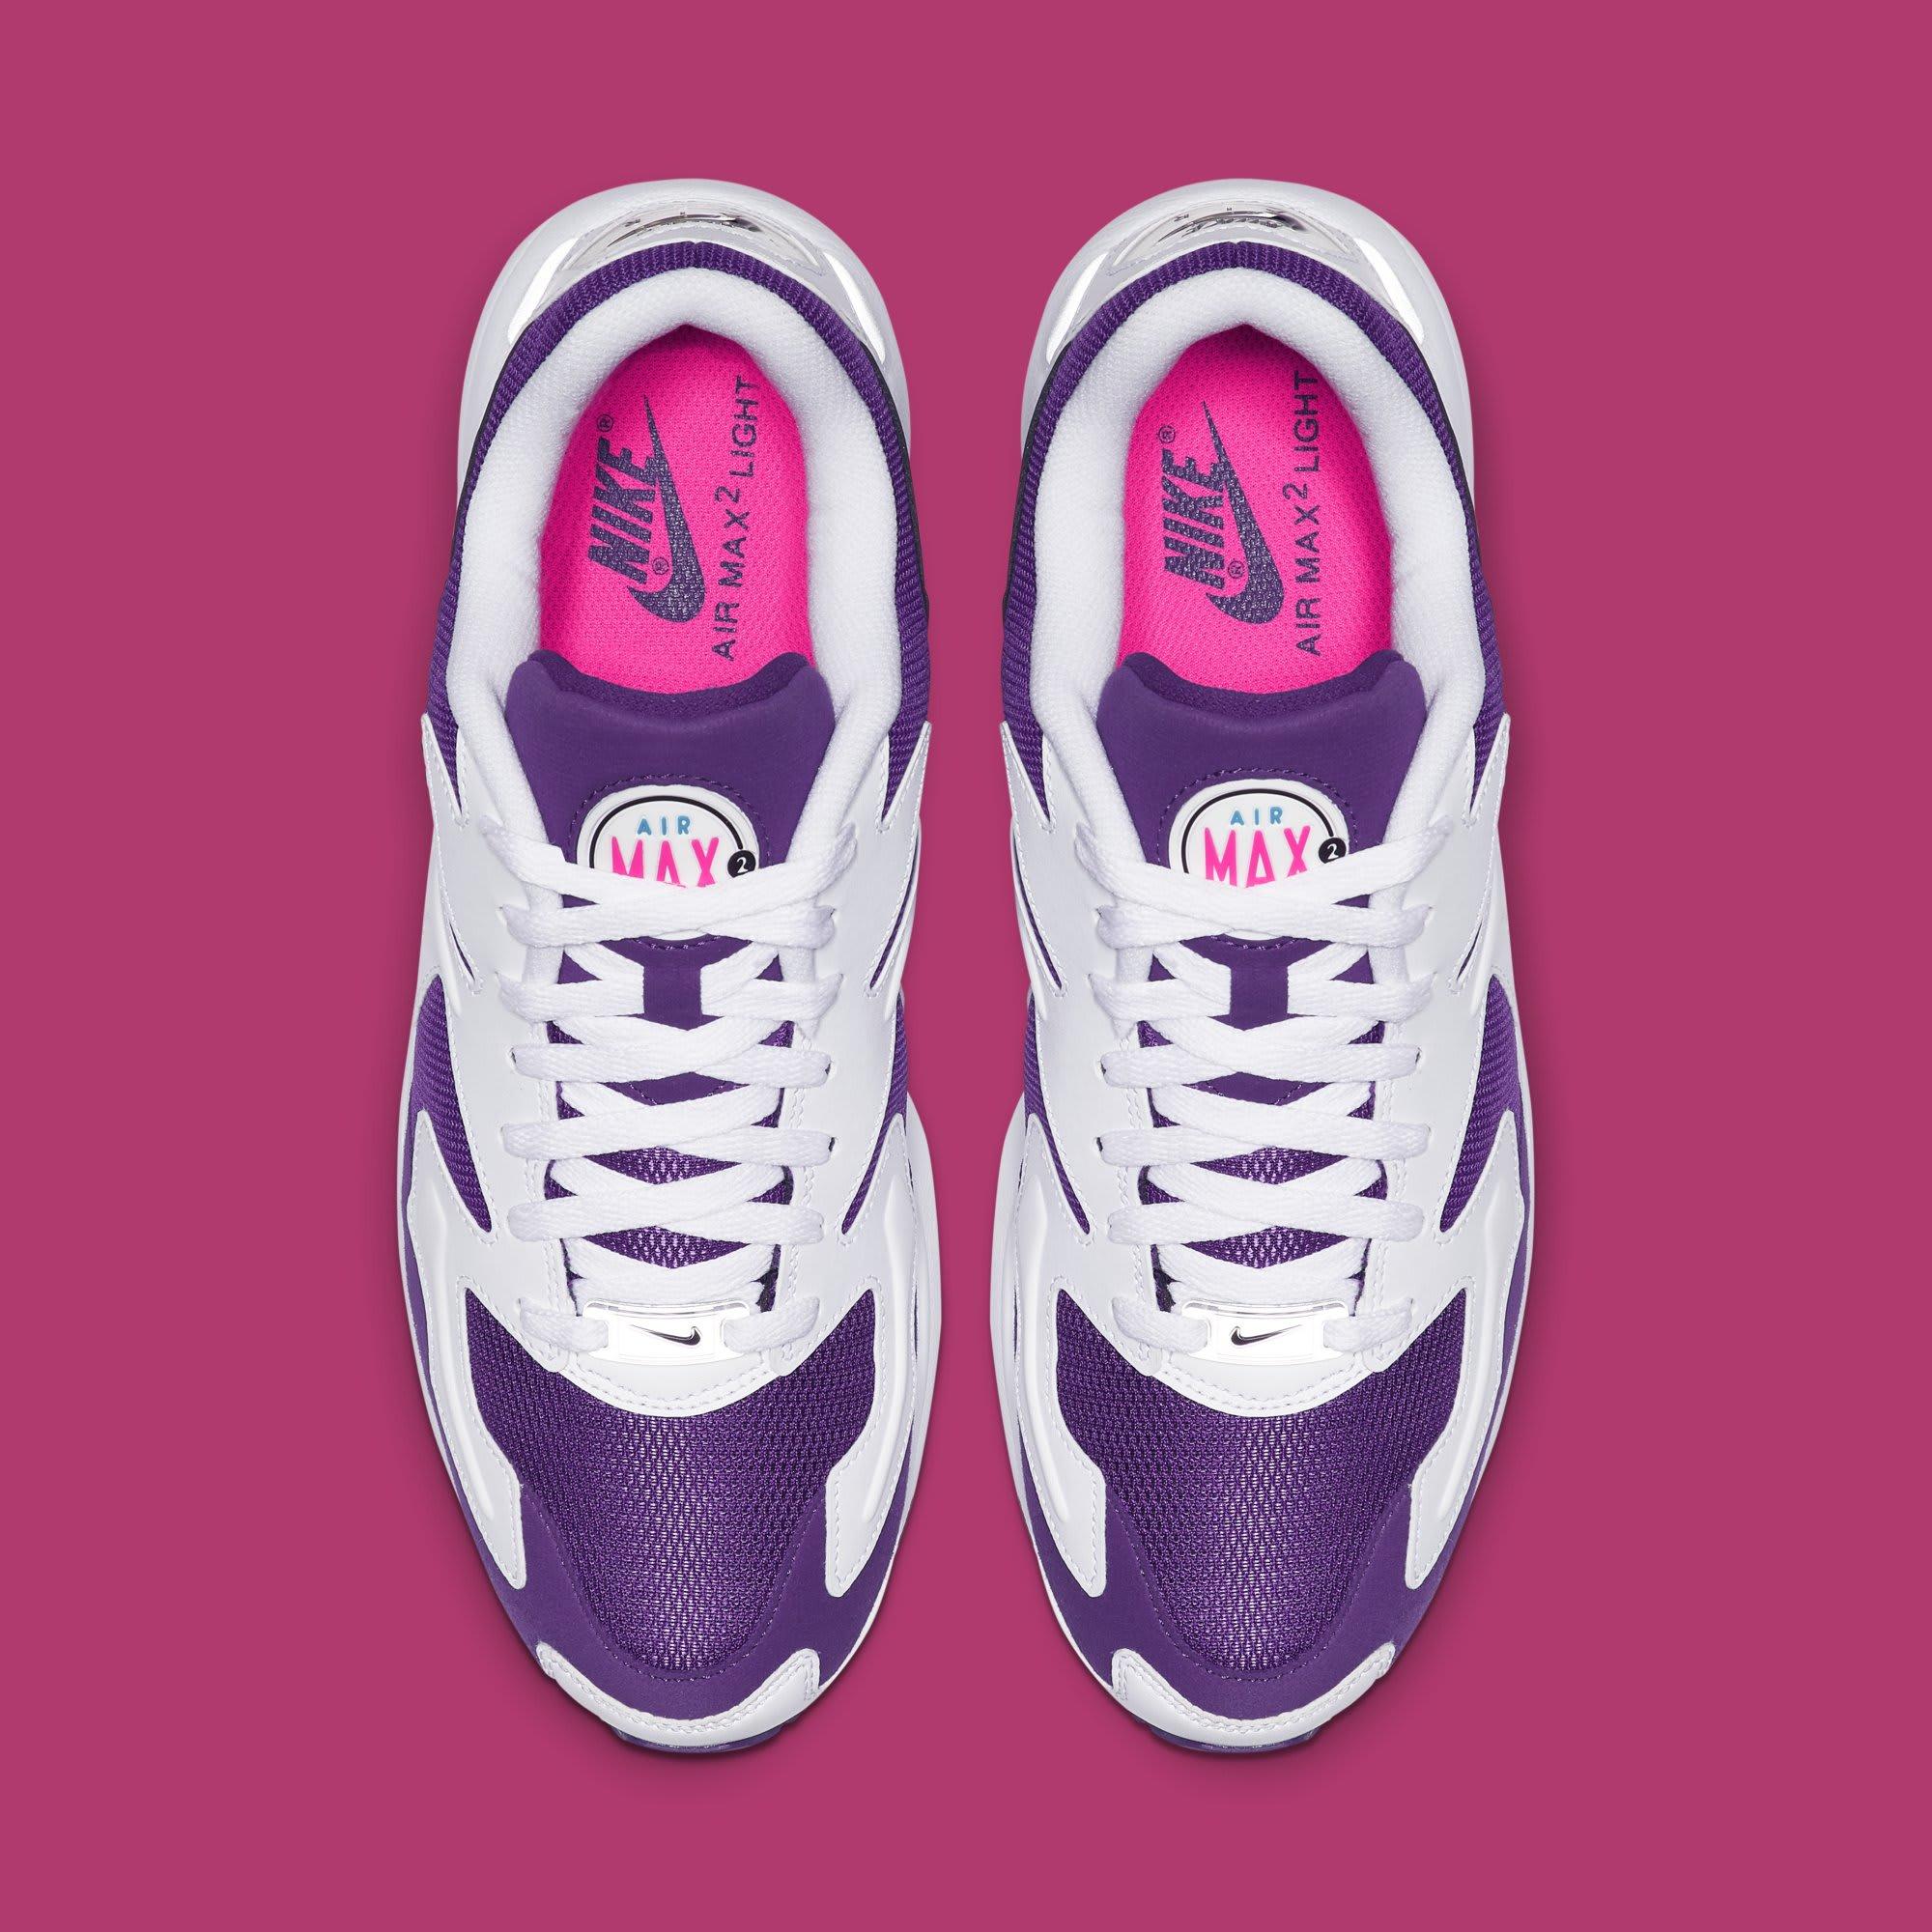 2168e04ad11 Image via Nike Nike Air Max2 Light  White Court Purple-Hyper Pink   AO1741-103